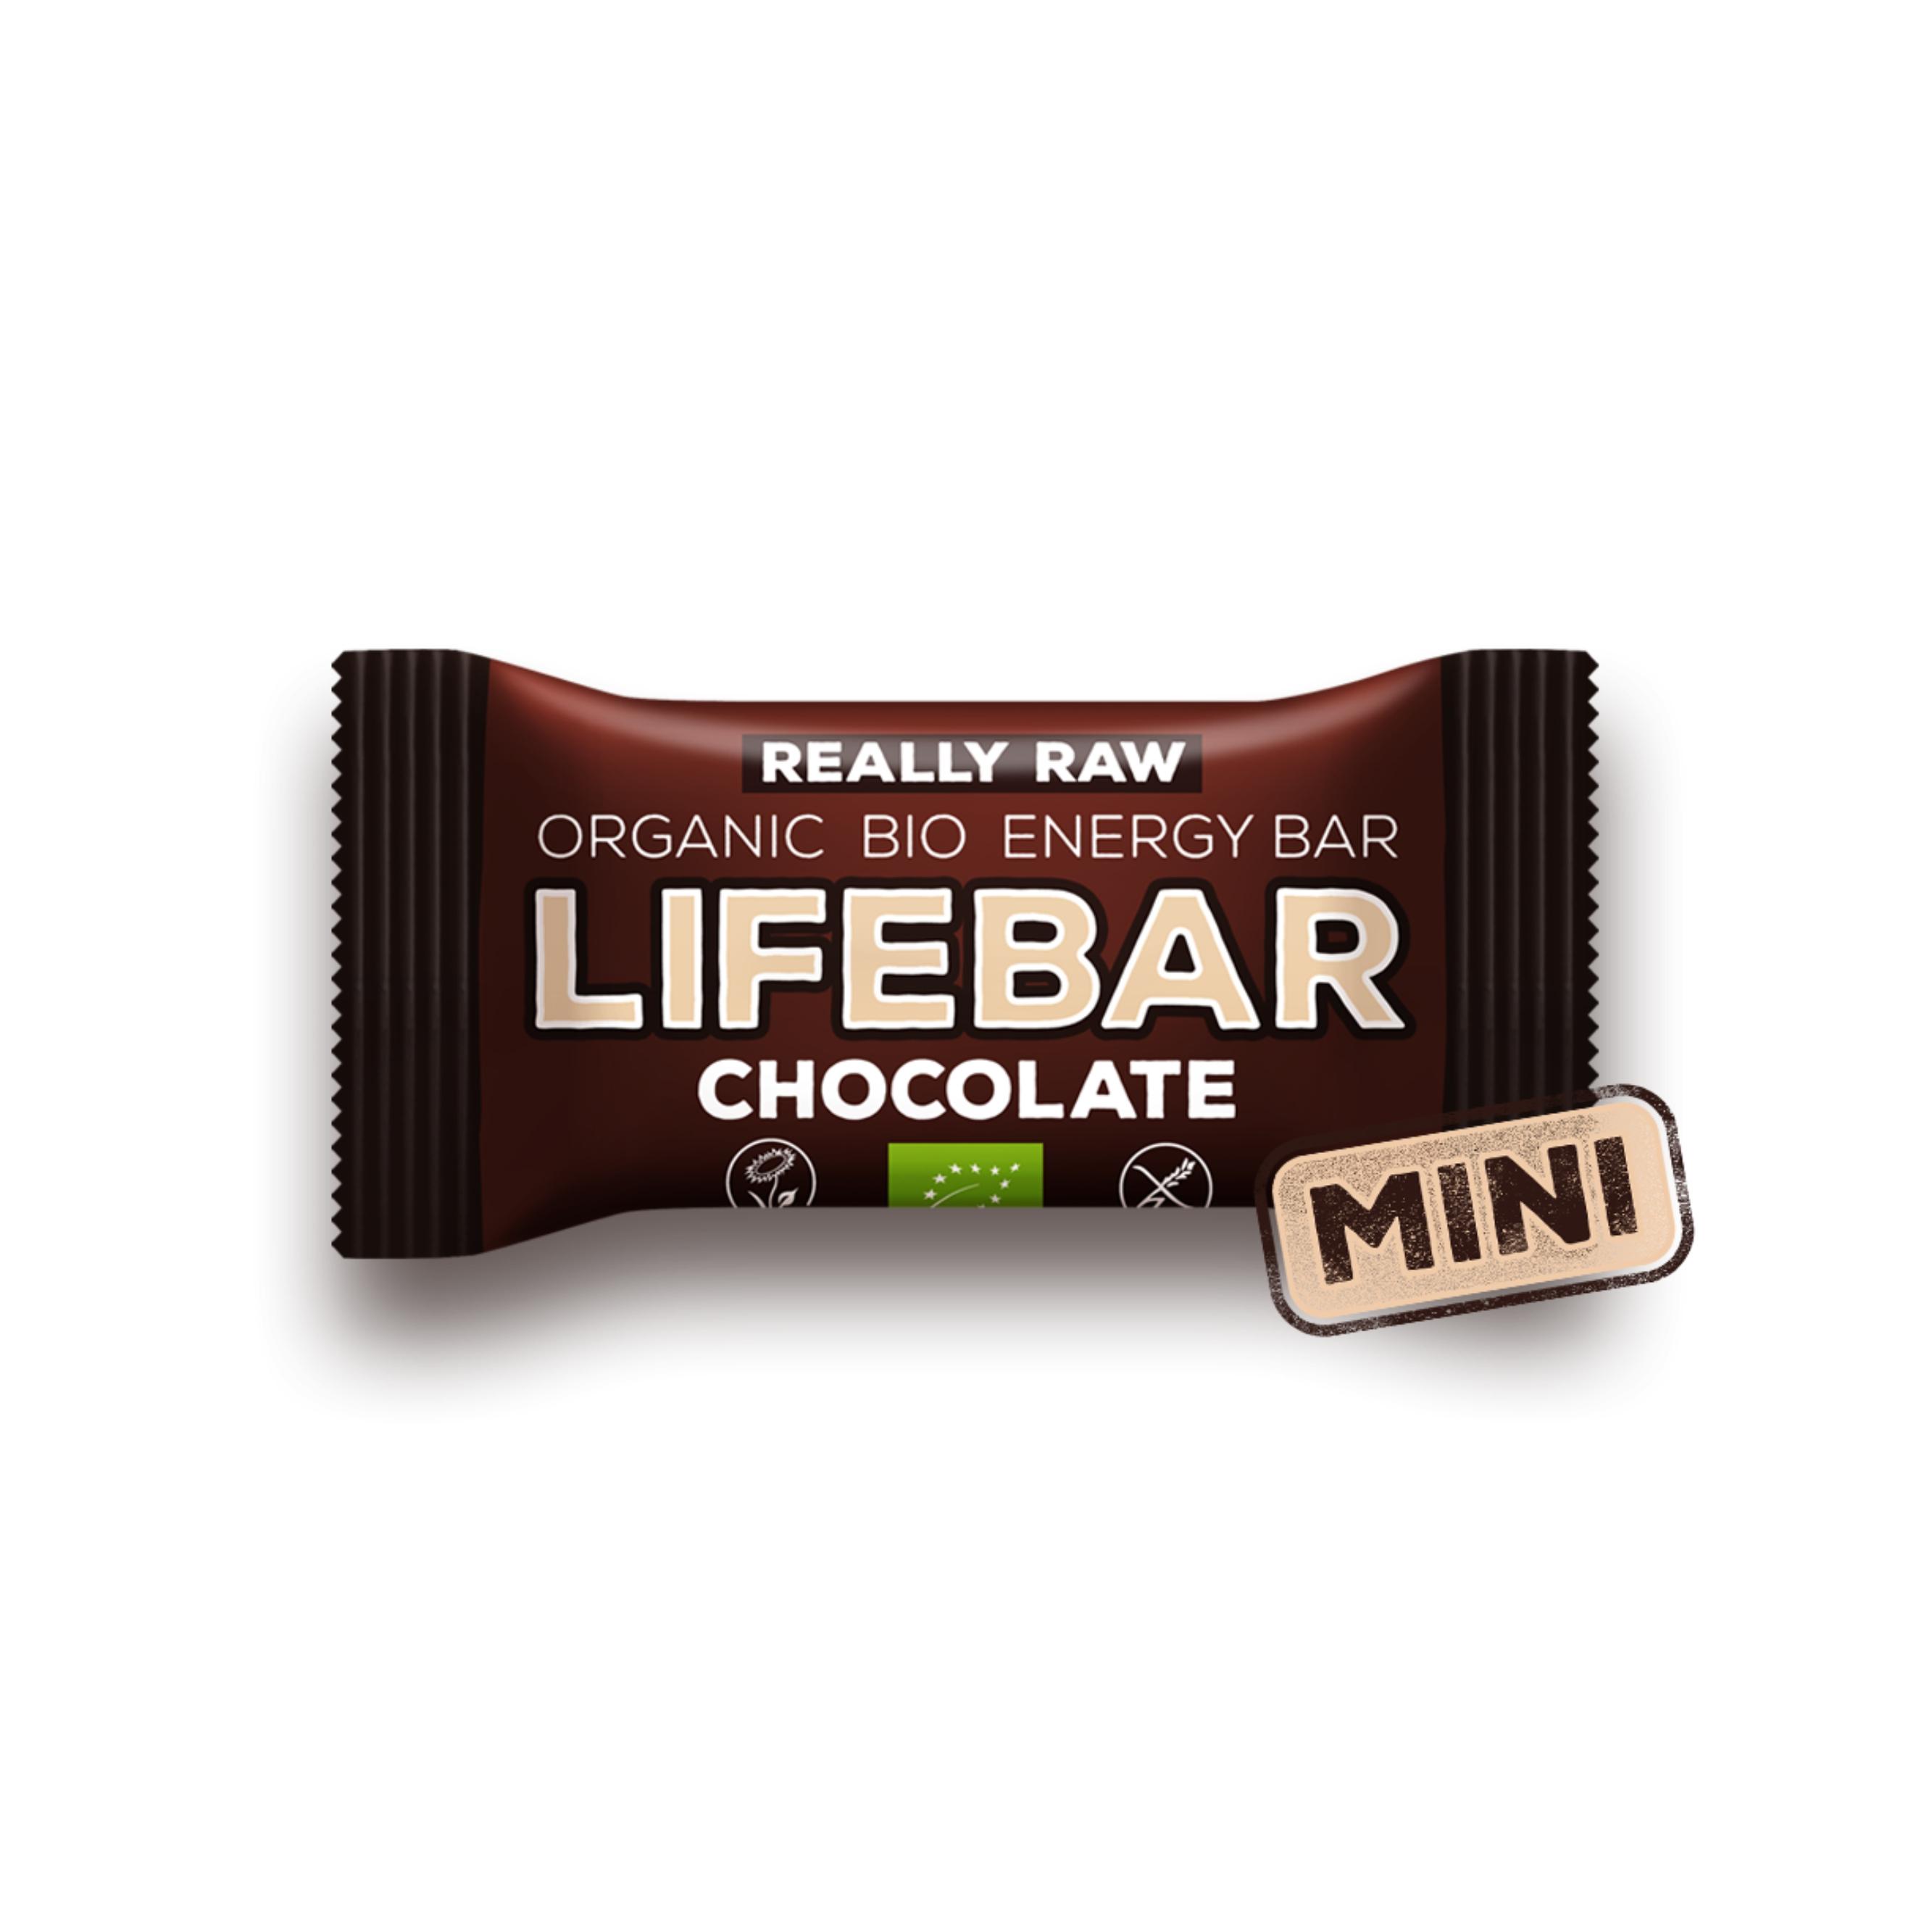 08ce9937b3dd Lifebar čokoládová MINI BIO RAW 25 g Lifefood - BIO a přírodní ...